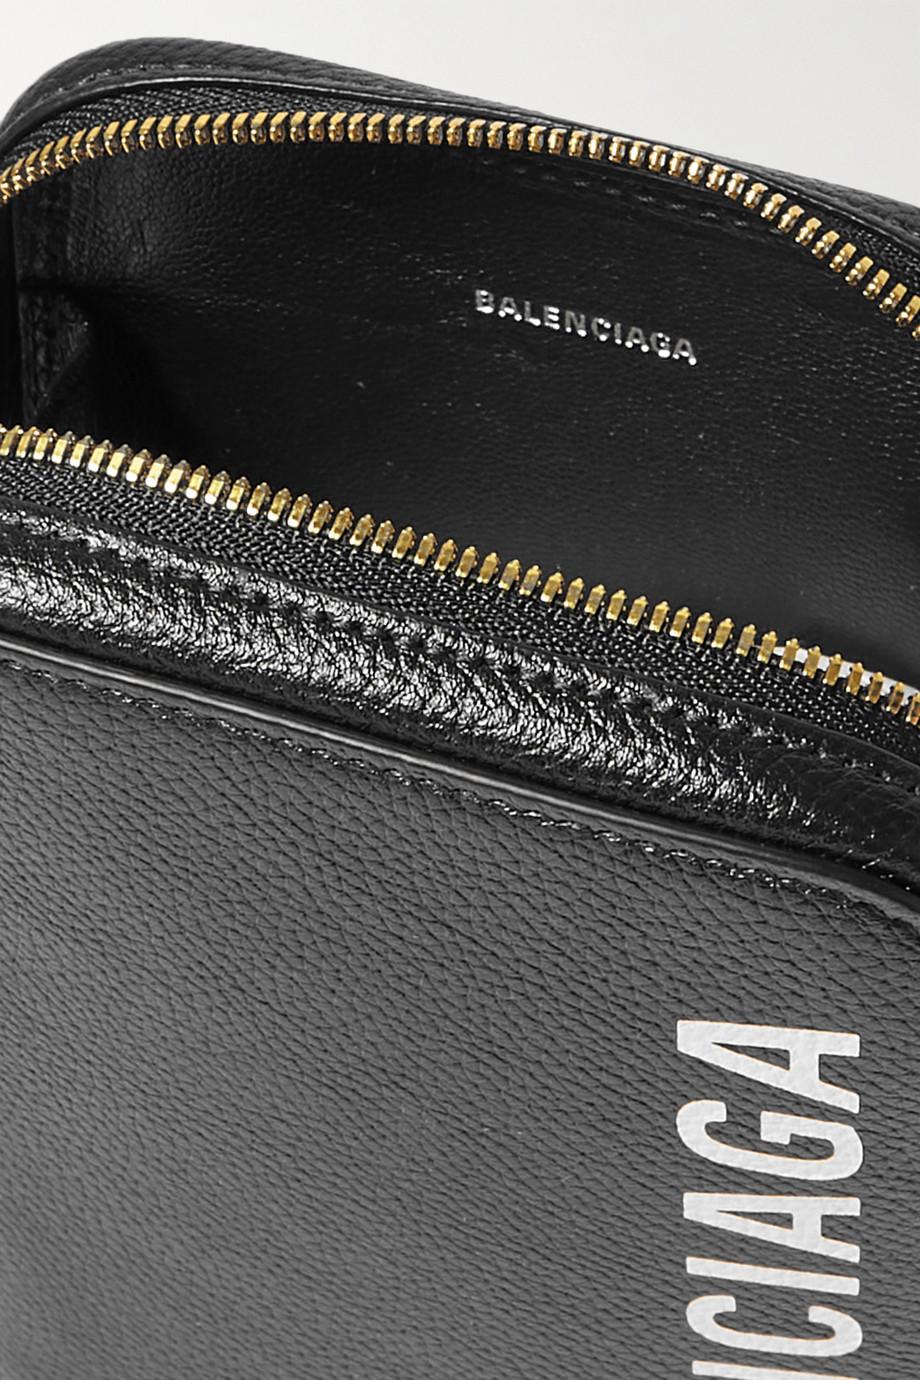 Balenciaga Cash textured-leather phone case